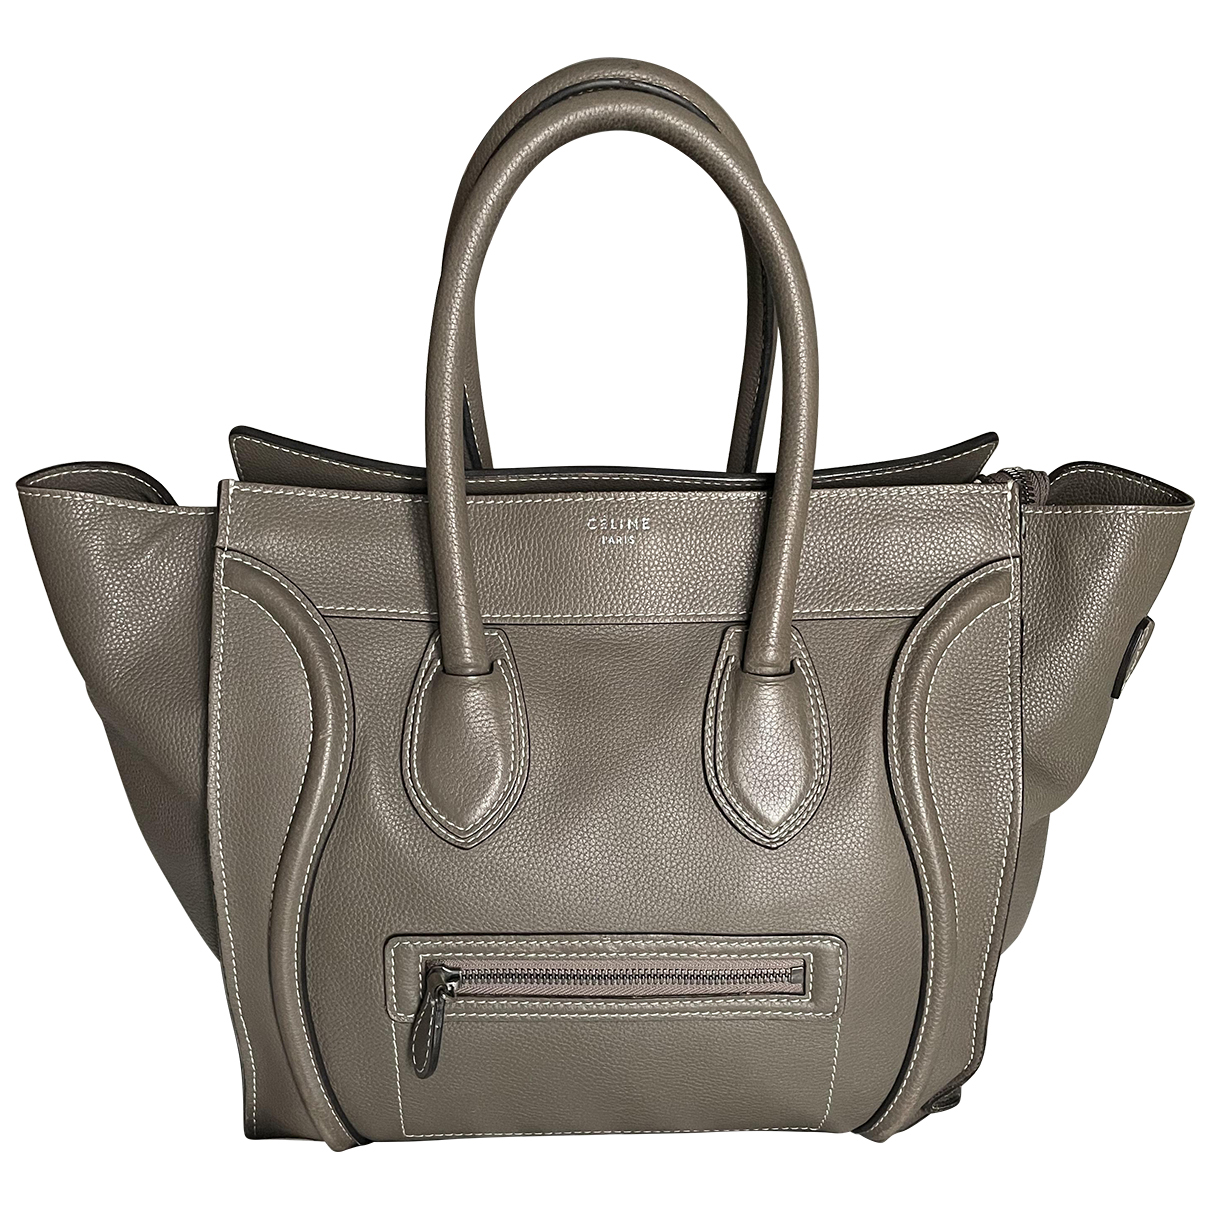 Celine Luggage Leather handbag for Women N